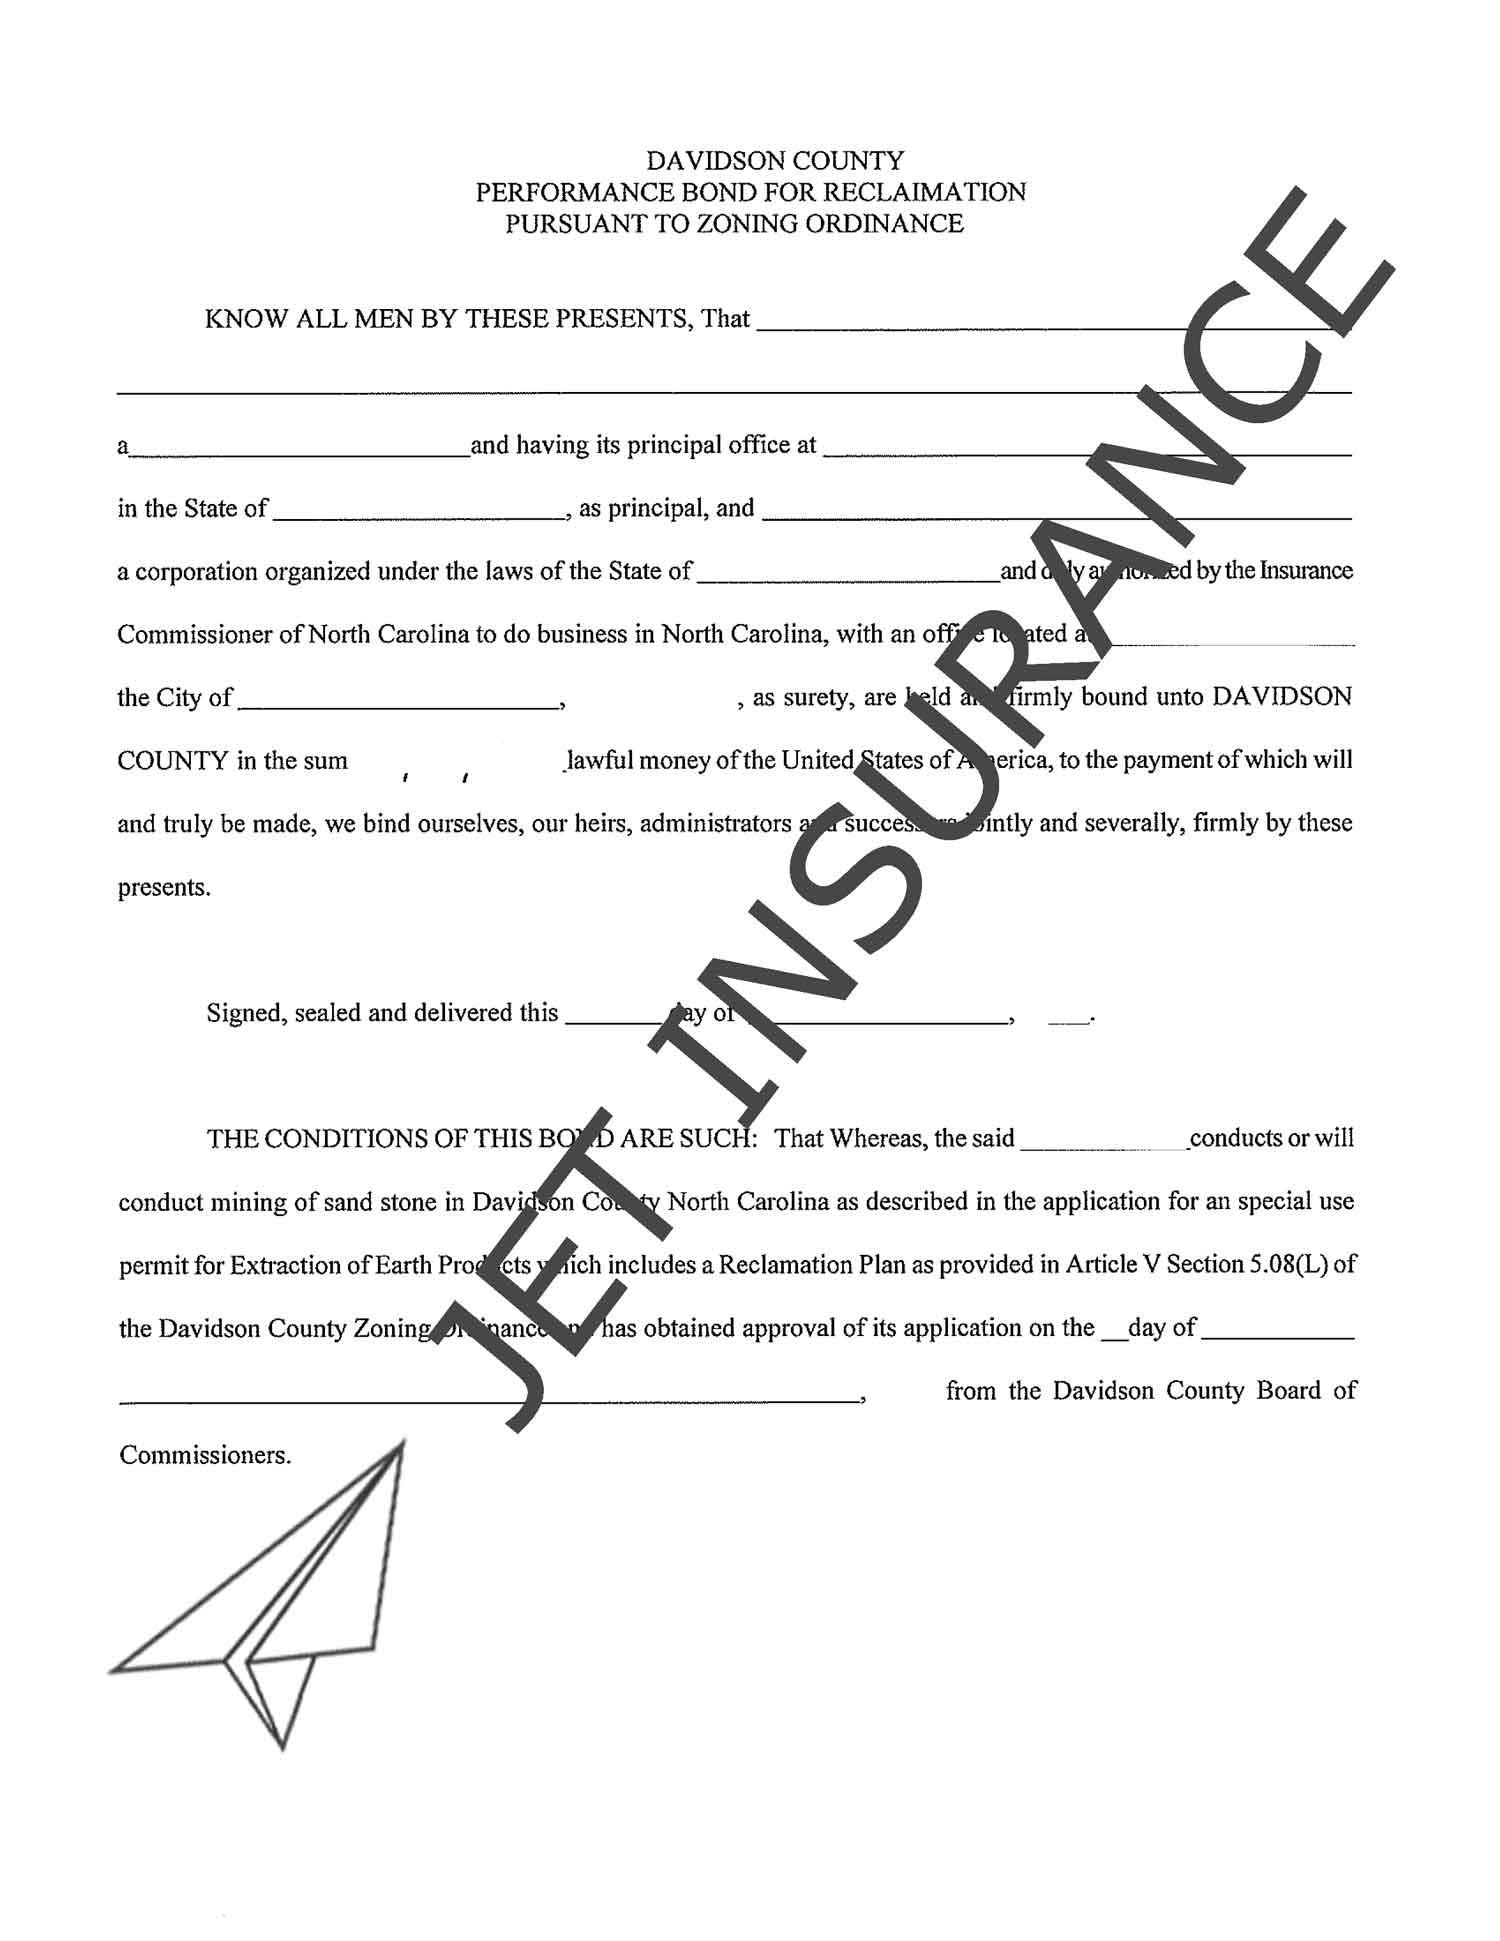 North Carolina Davidson County Zoning Ordinance Reclamation Bond Form